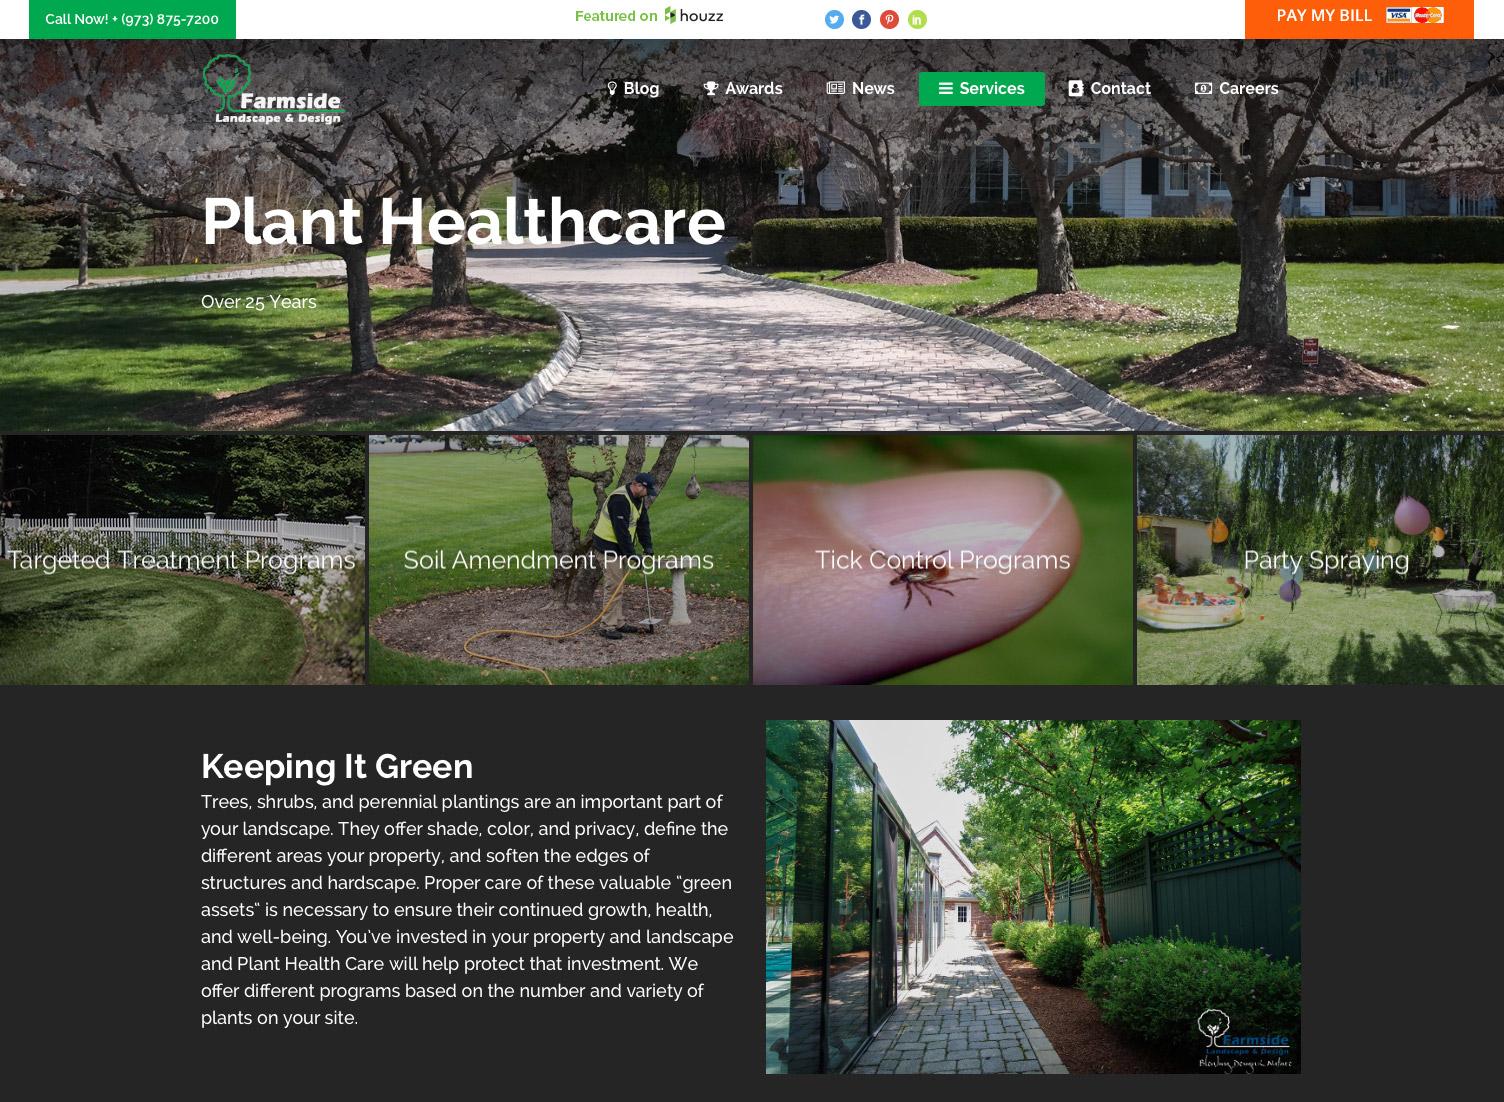 farmside-plant-healthcare